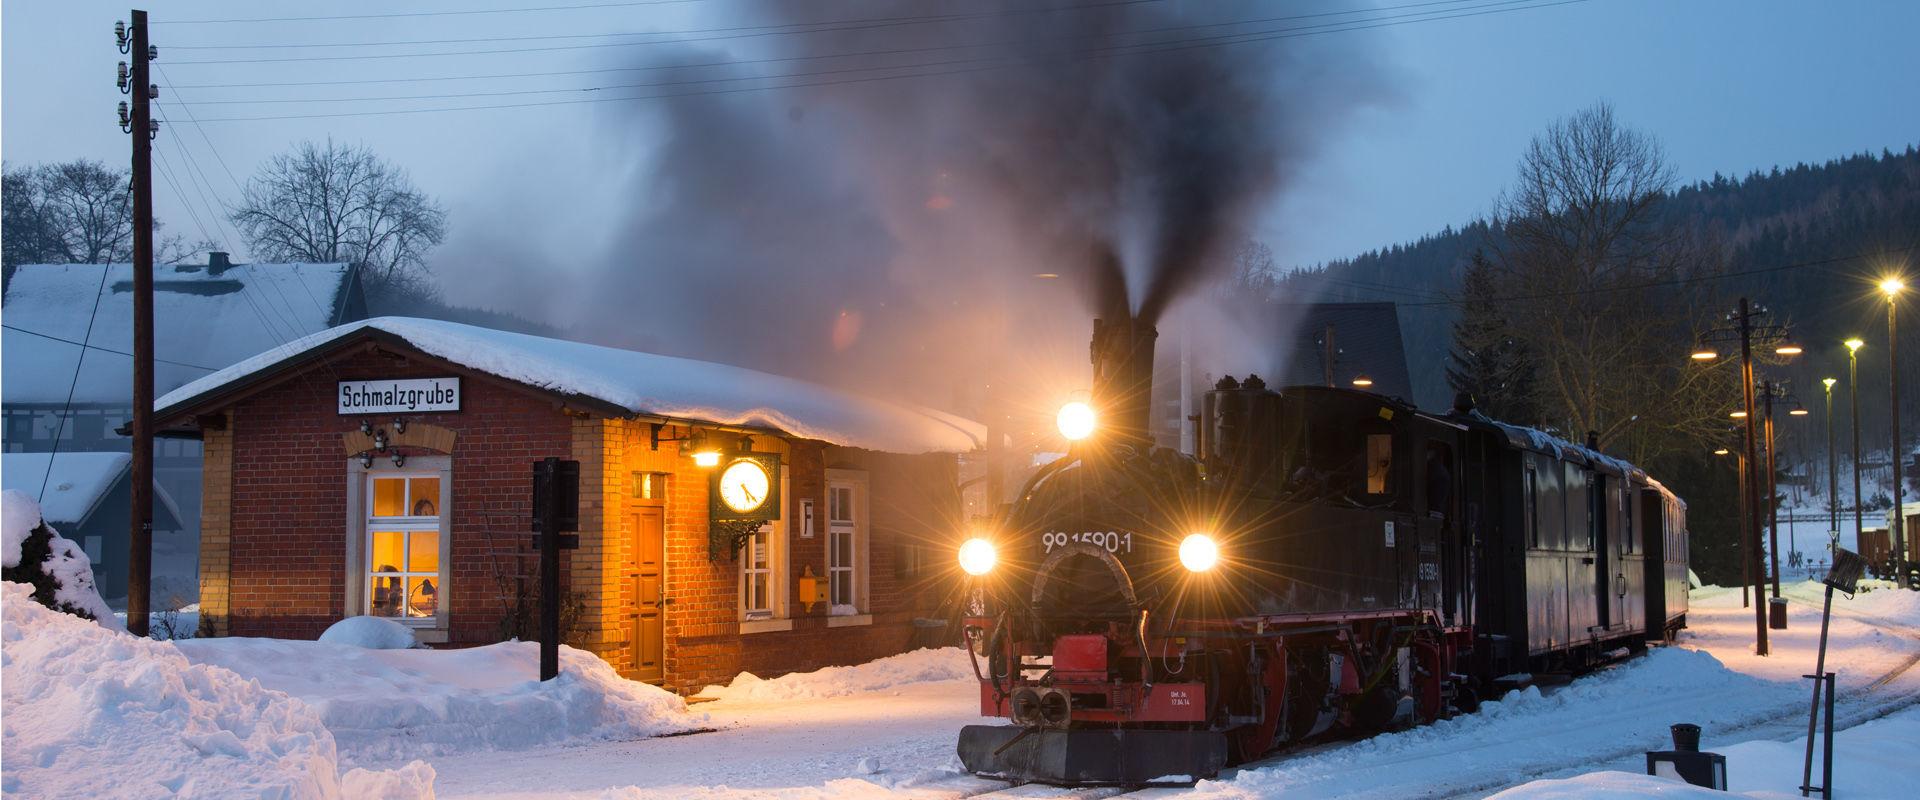 Preßnitztalbahn im Winter - Bahnhof Schmalzgrube  © CHRISTIAN SACHER